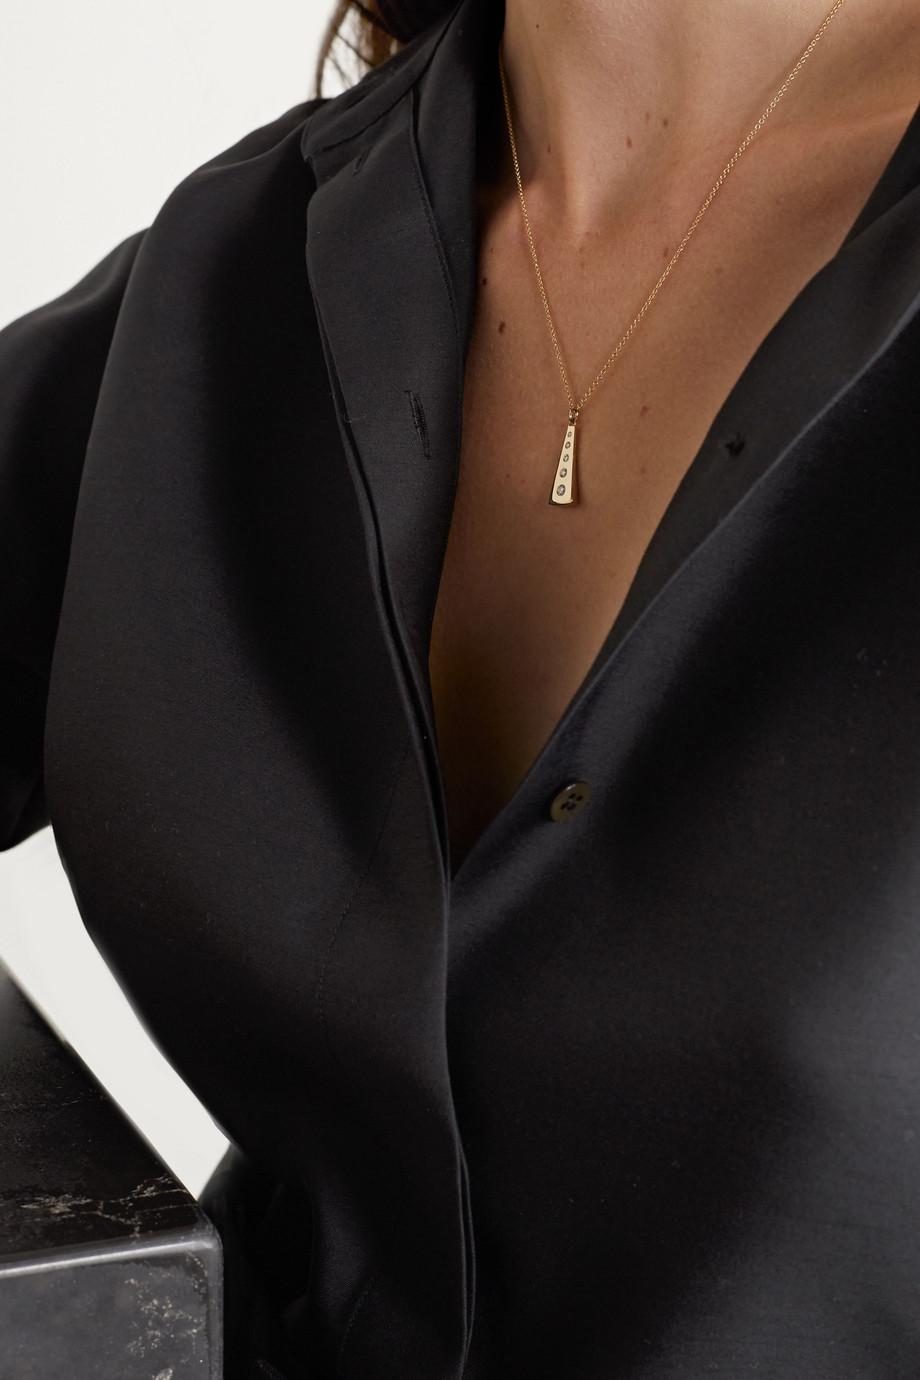 Lorraine Schwartz Collier en or 18 carats et diamants